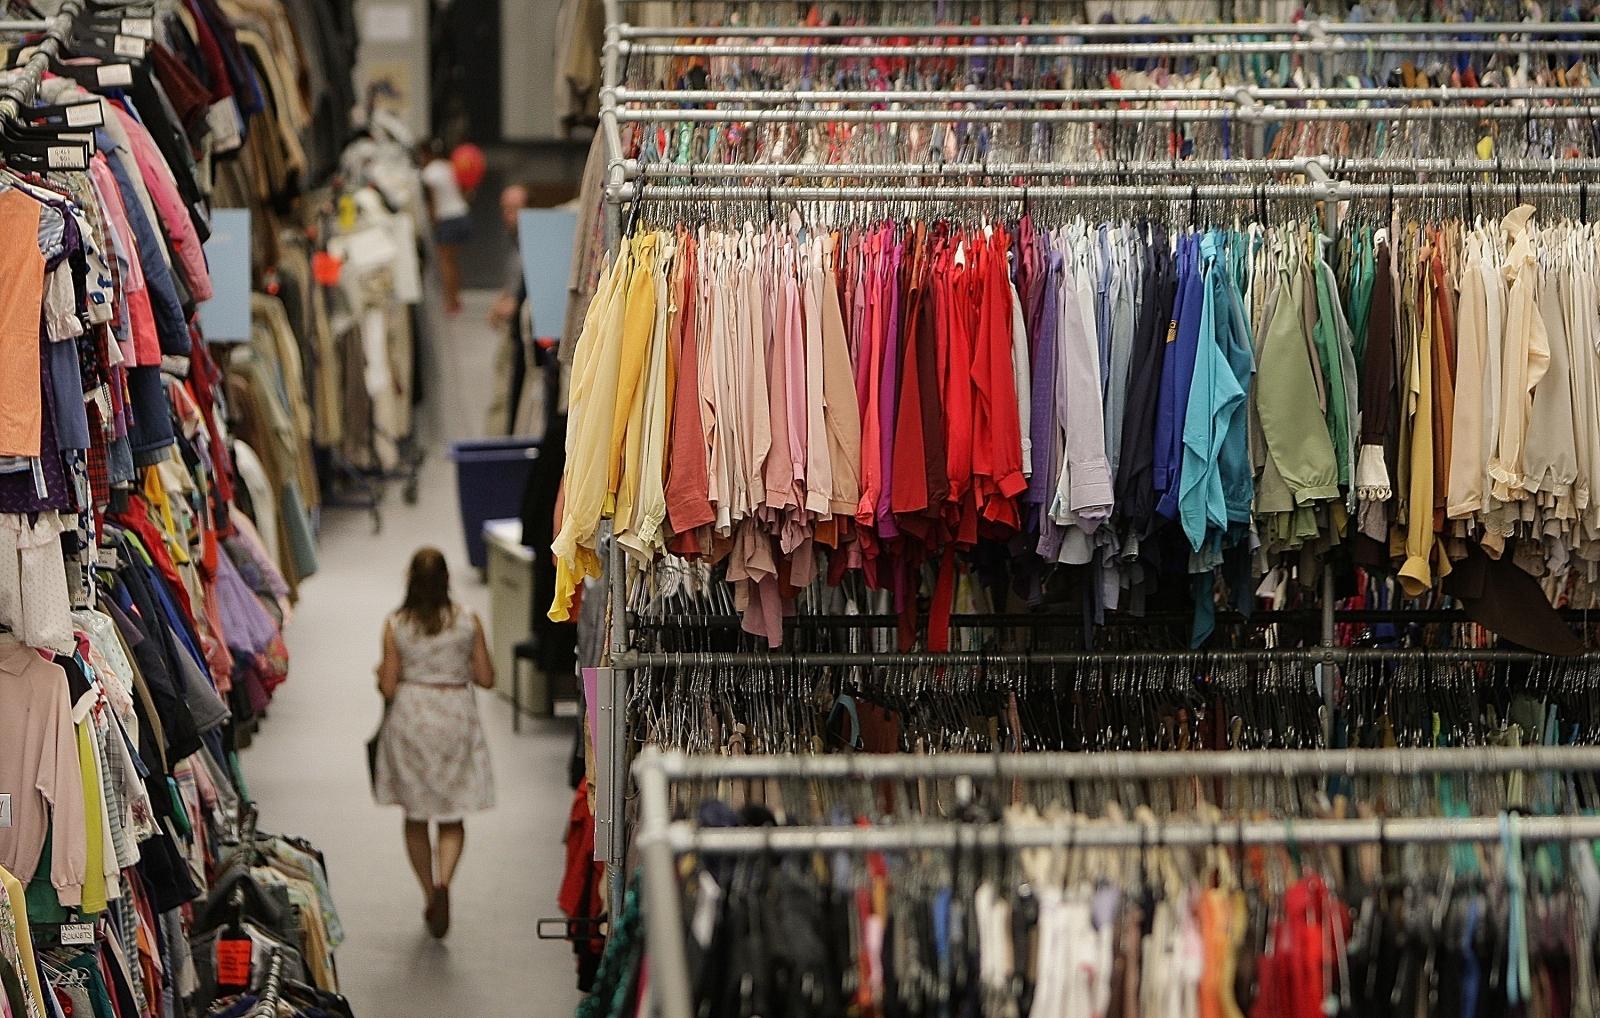 A woman walks between racks of clothes